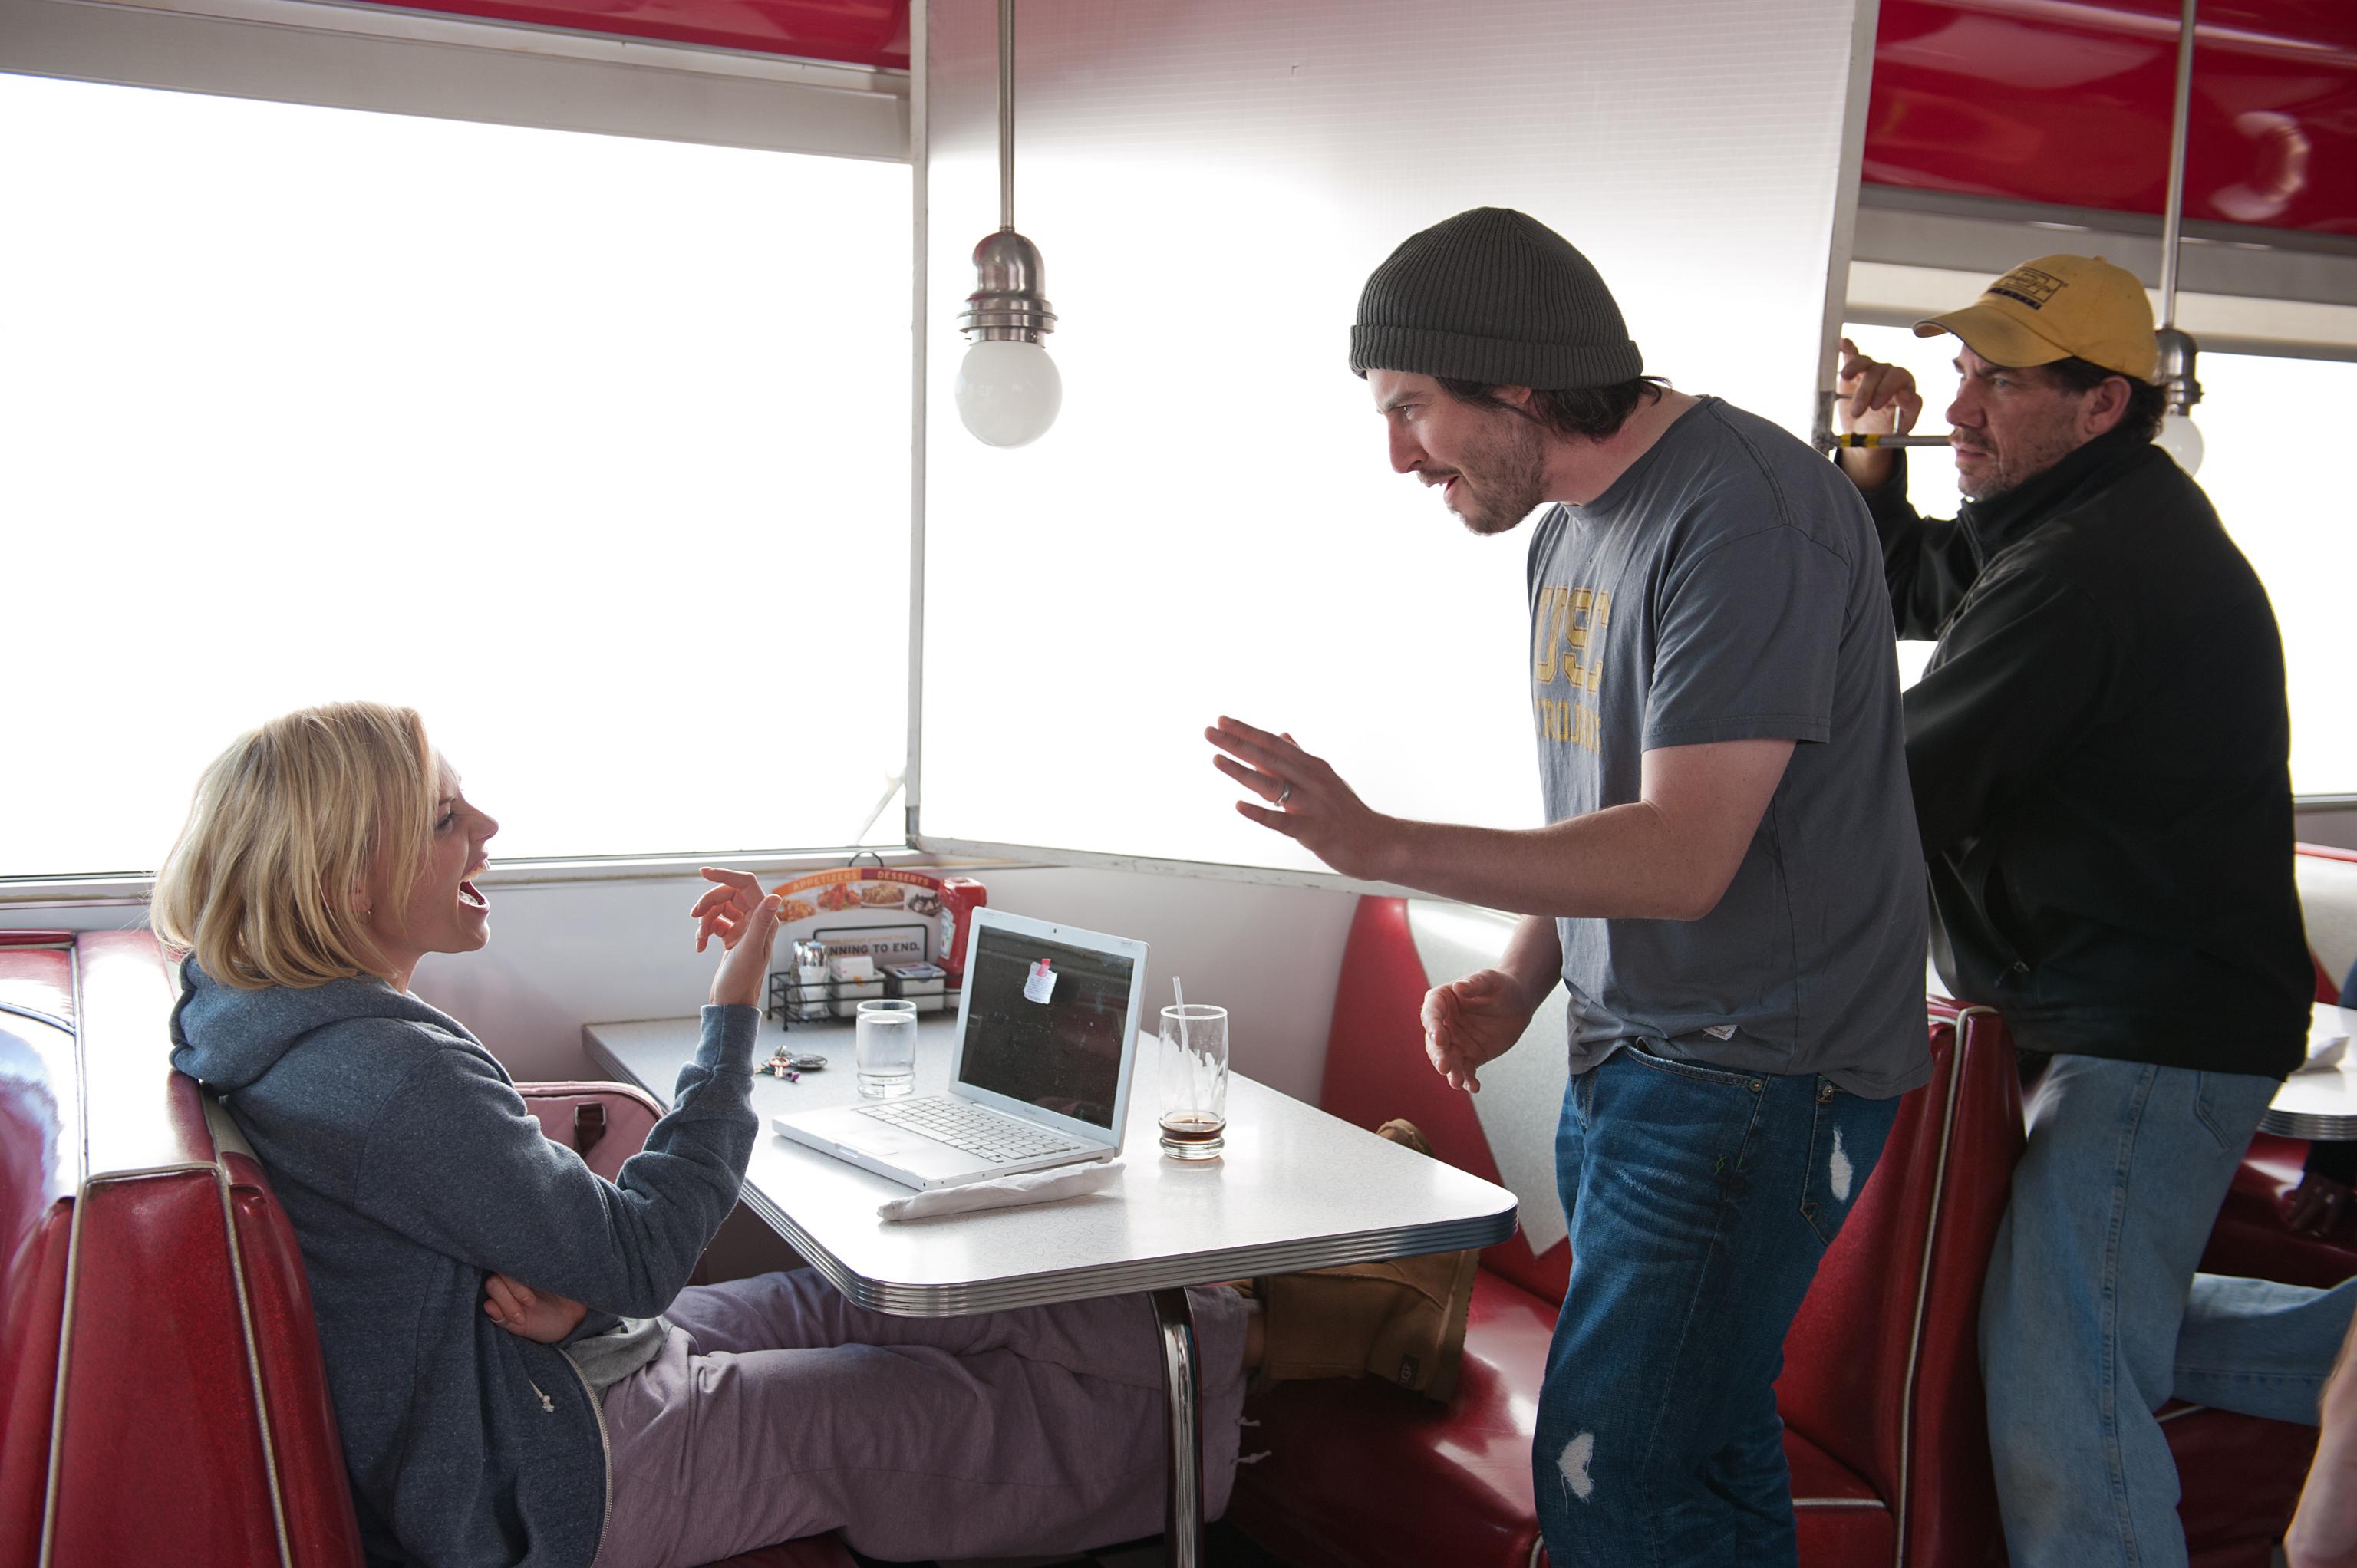 jason reitman charlize theron young adult set image 1 Episode image for Paul Anka   Original Teen Idol